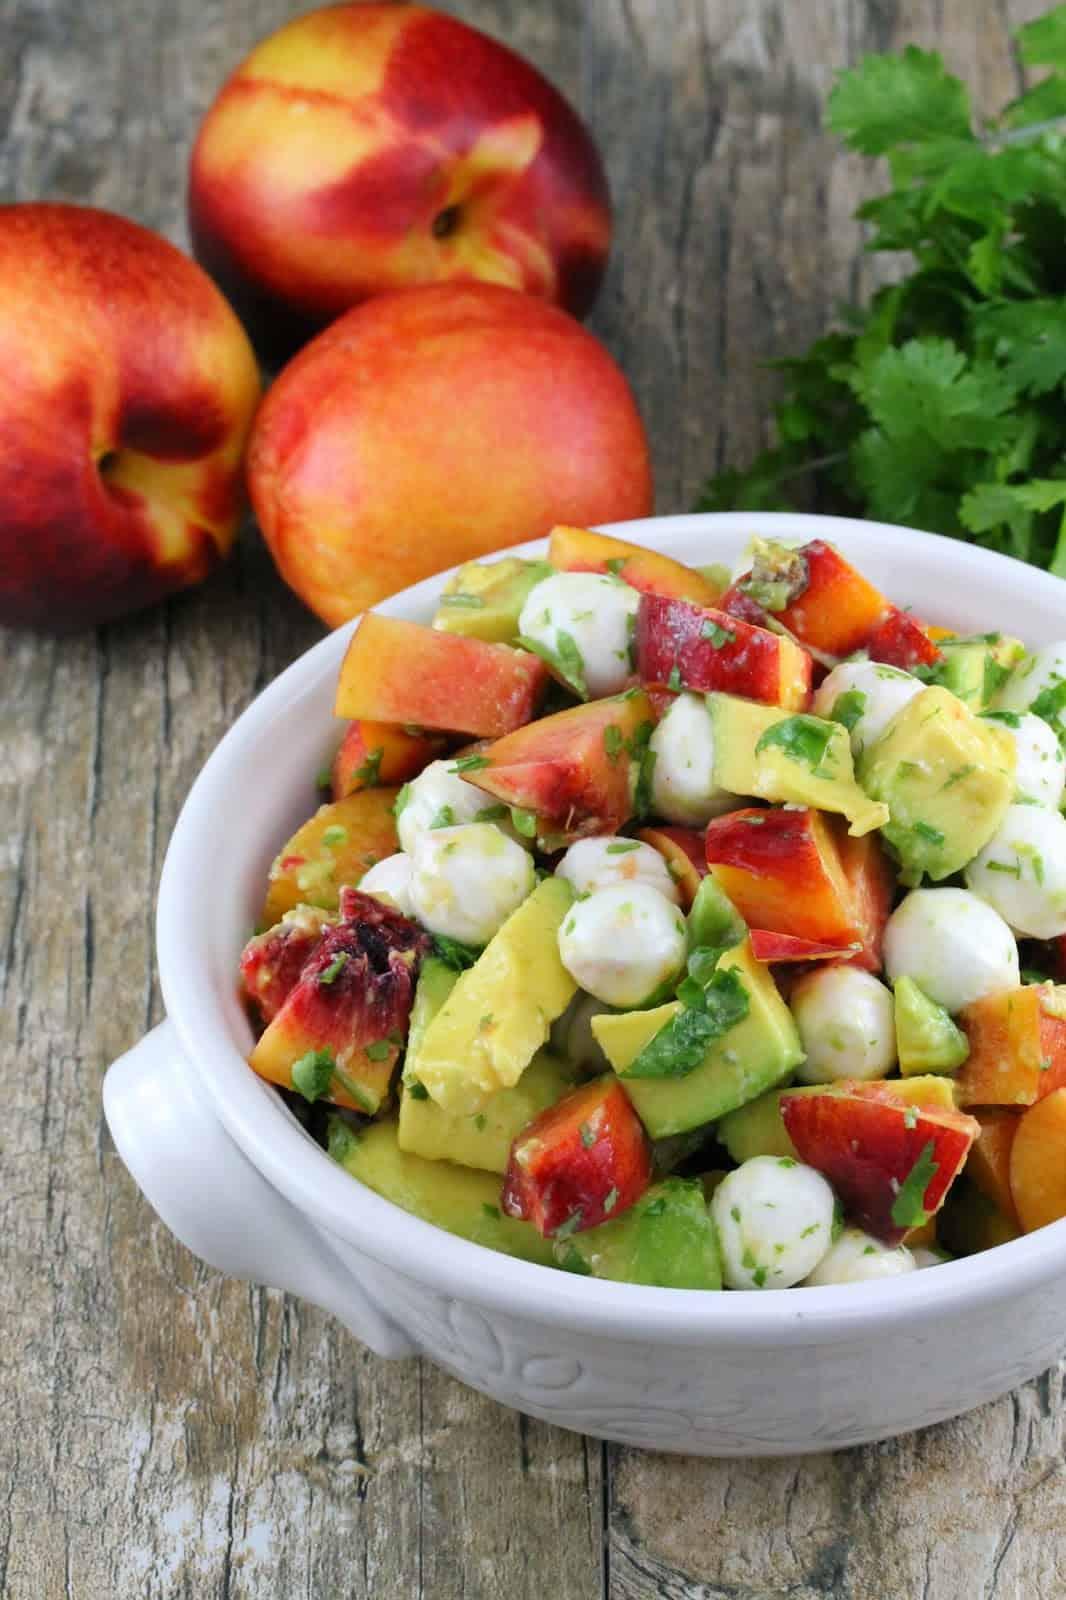 Nectarine and Avocado Fruit Salad in a white bowl sitting next to three nectarines.